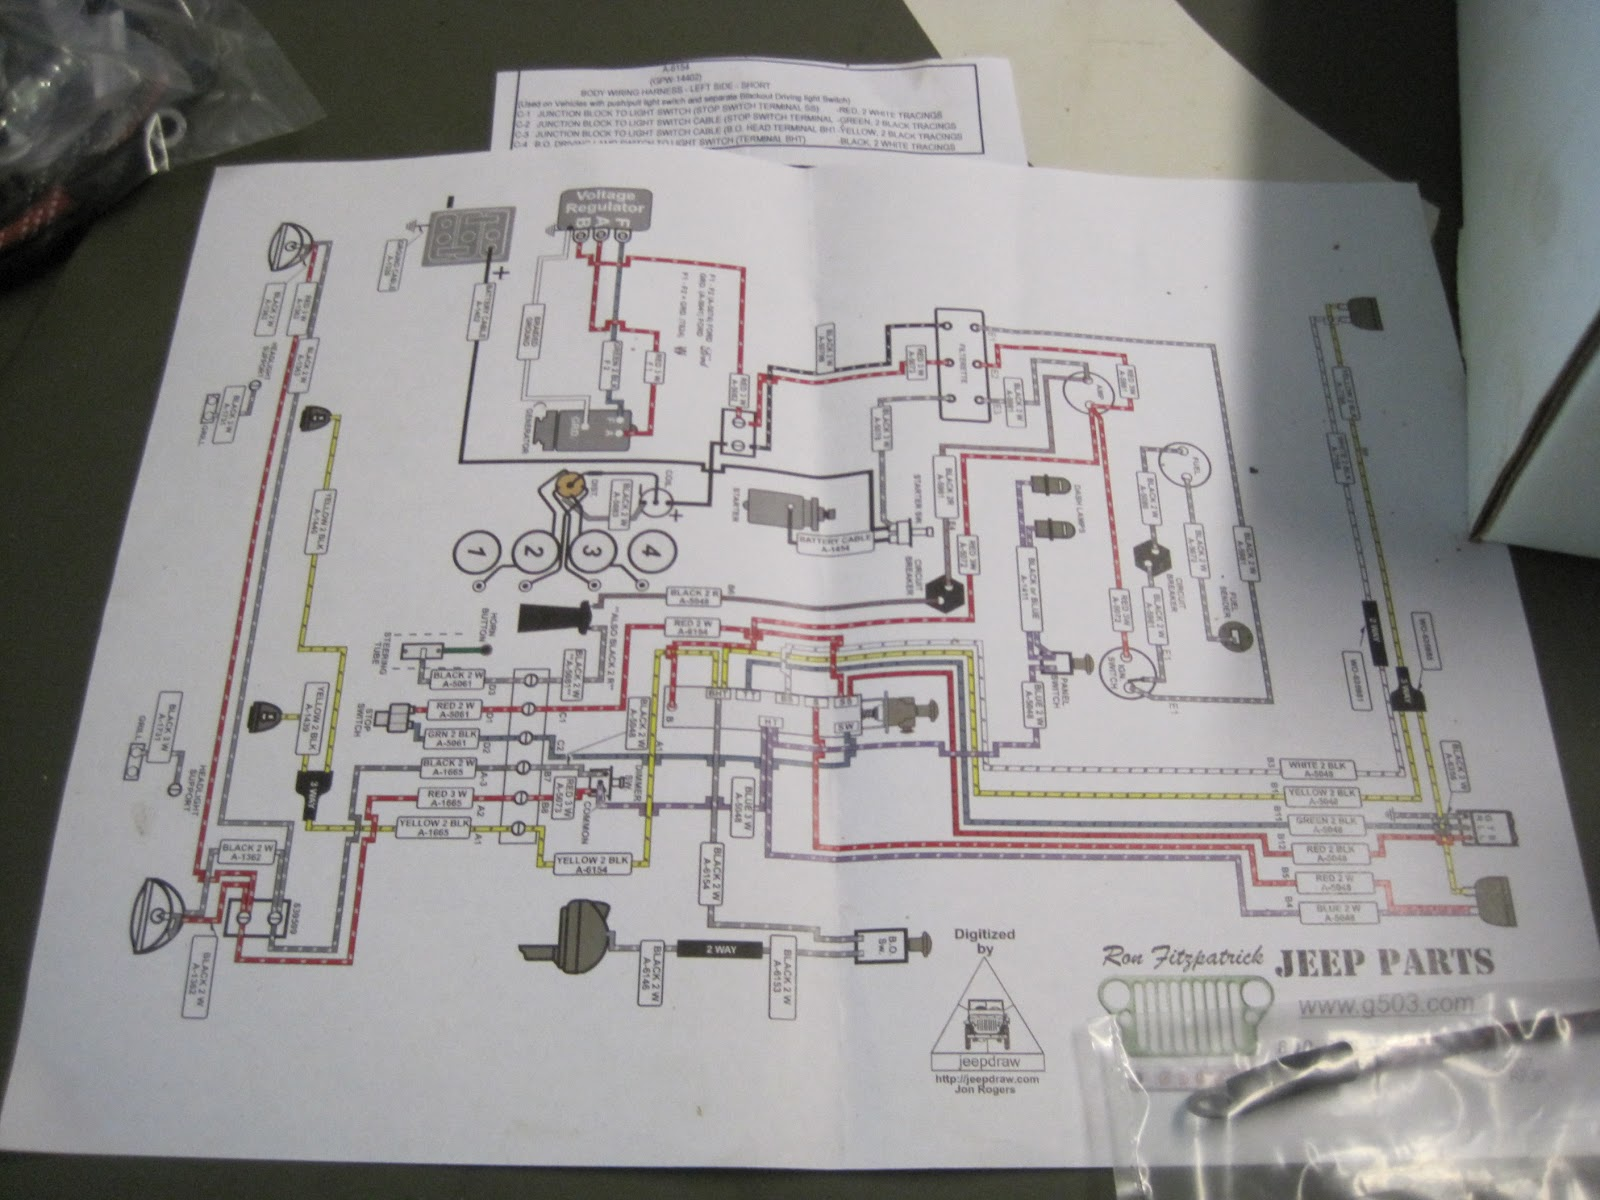 Rustbucket Resto: An Electrical Storm!